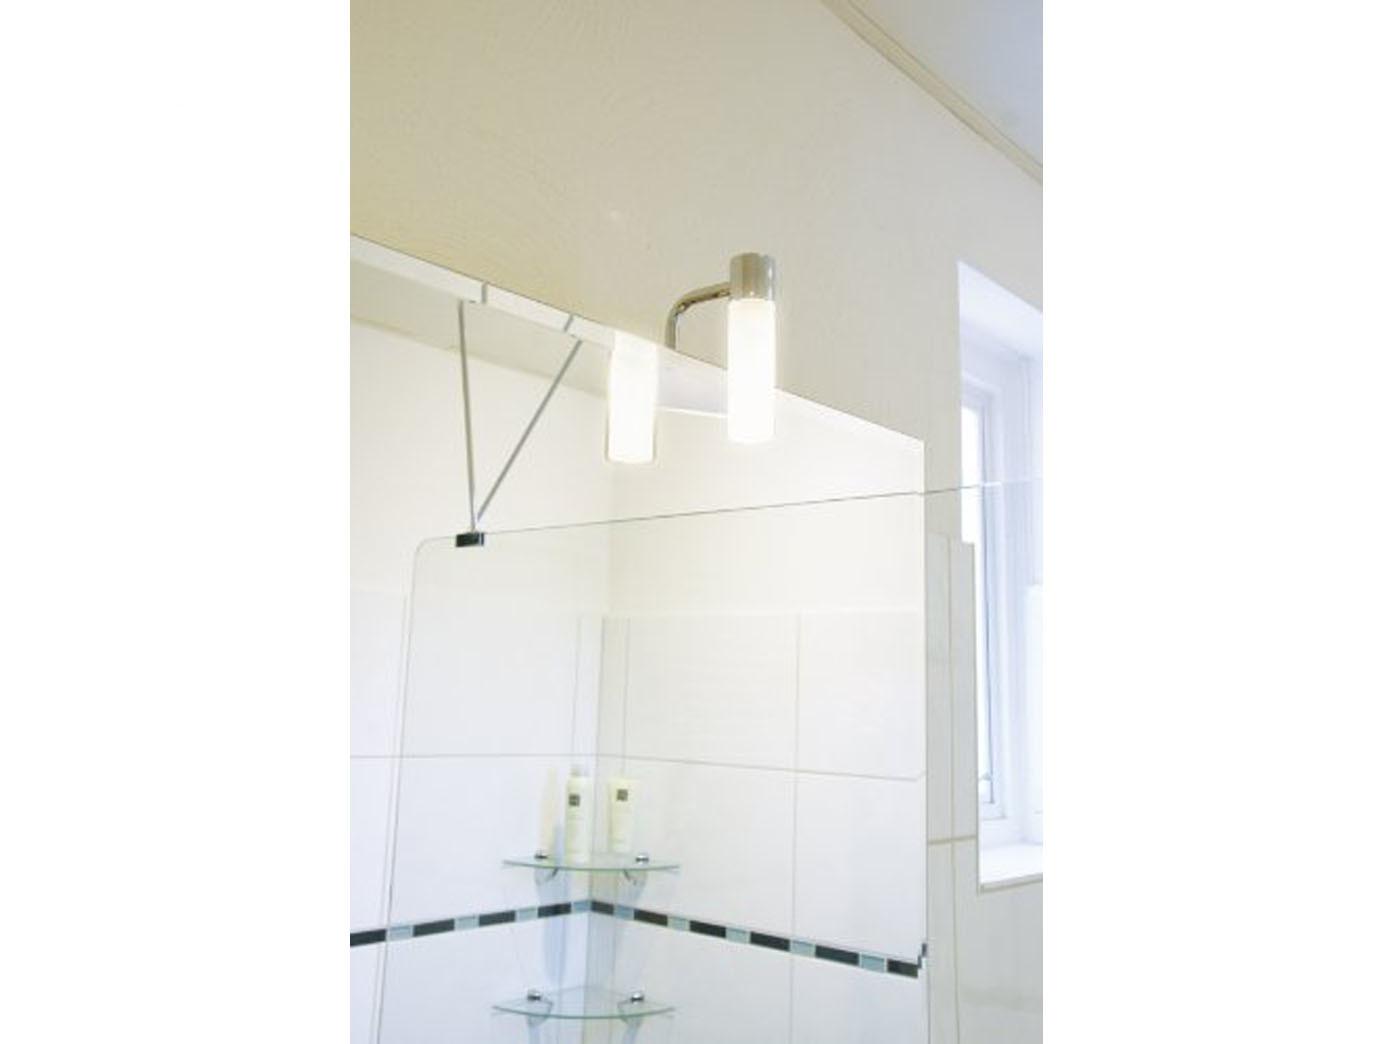 badezimmer spiegelleuchte mit led lampenschirm glas. Black Bedroom Furniture Sets. Home Design Ideas